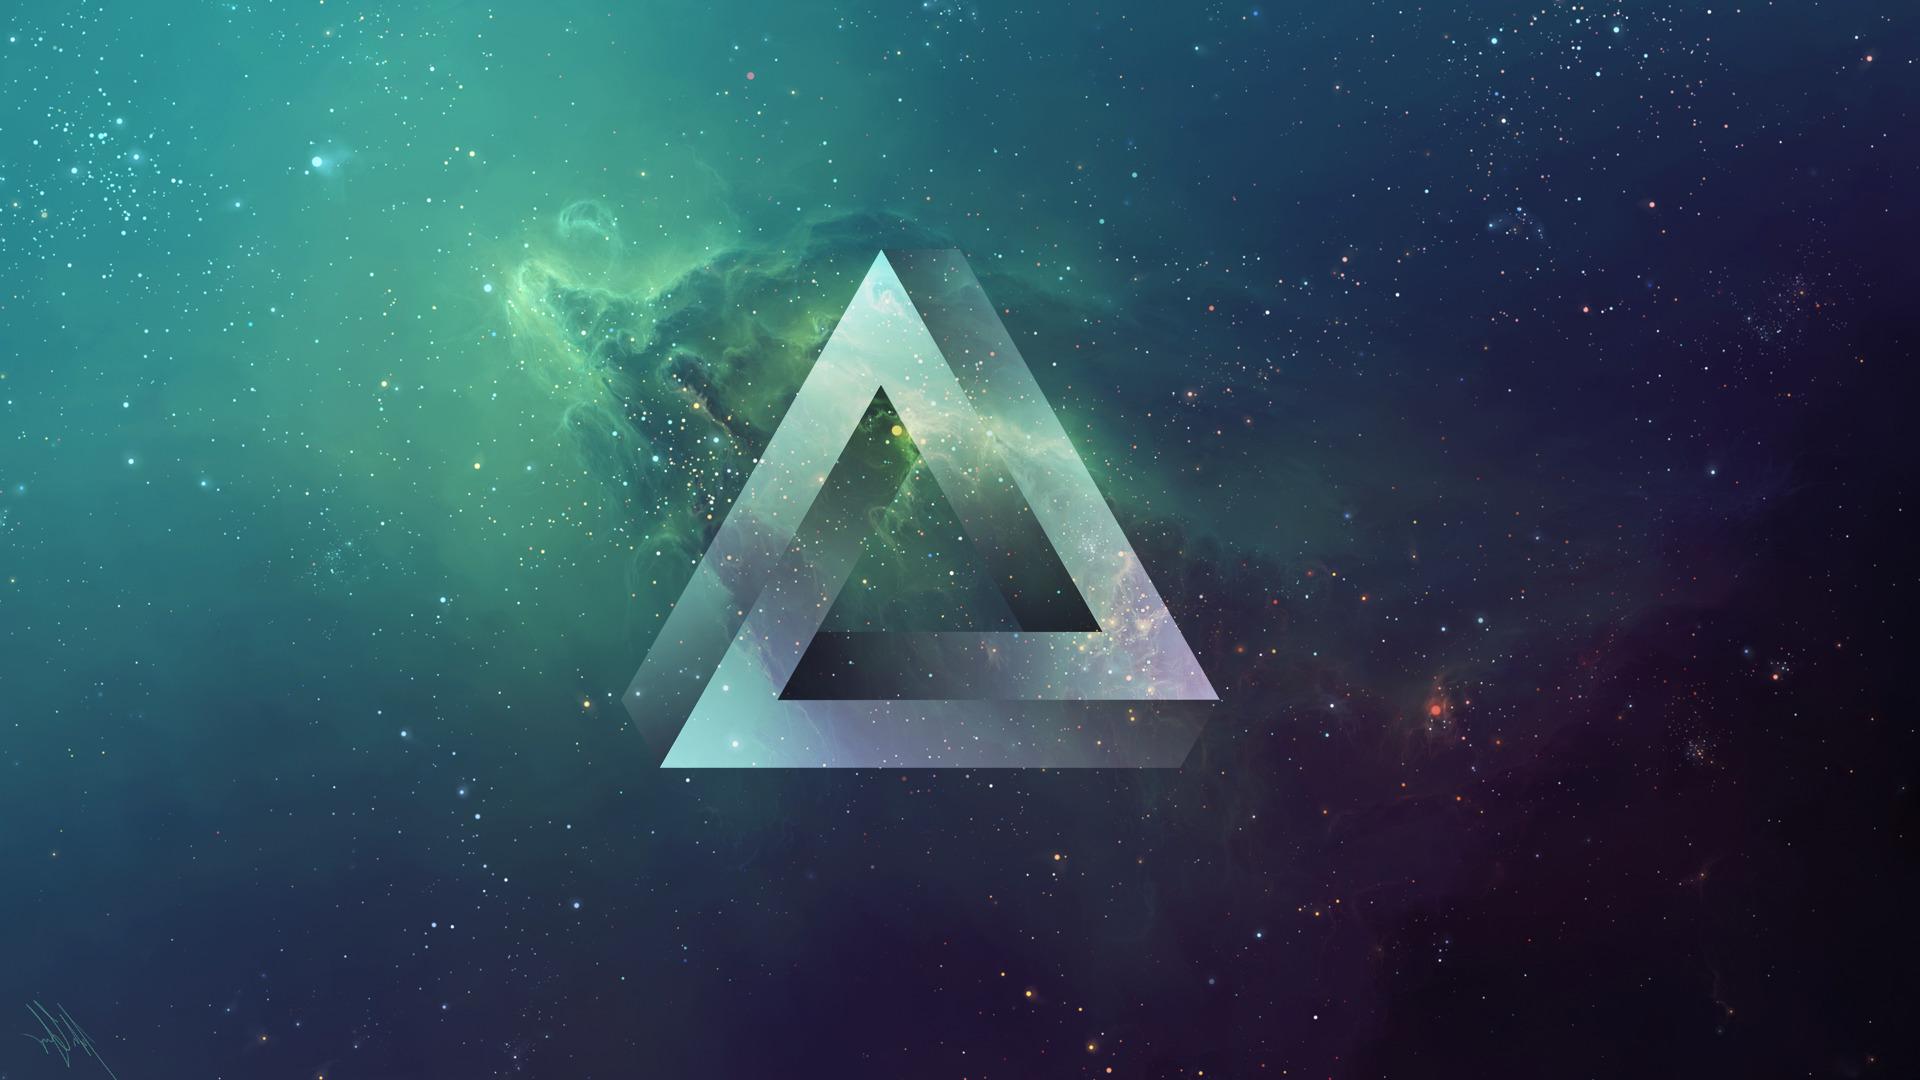 Gravity Falls Best Wallpaper Triangle Space Tylercreatesworlds Penrose Triangle